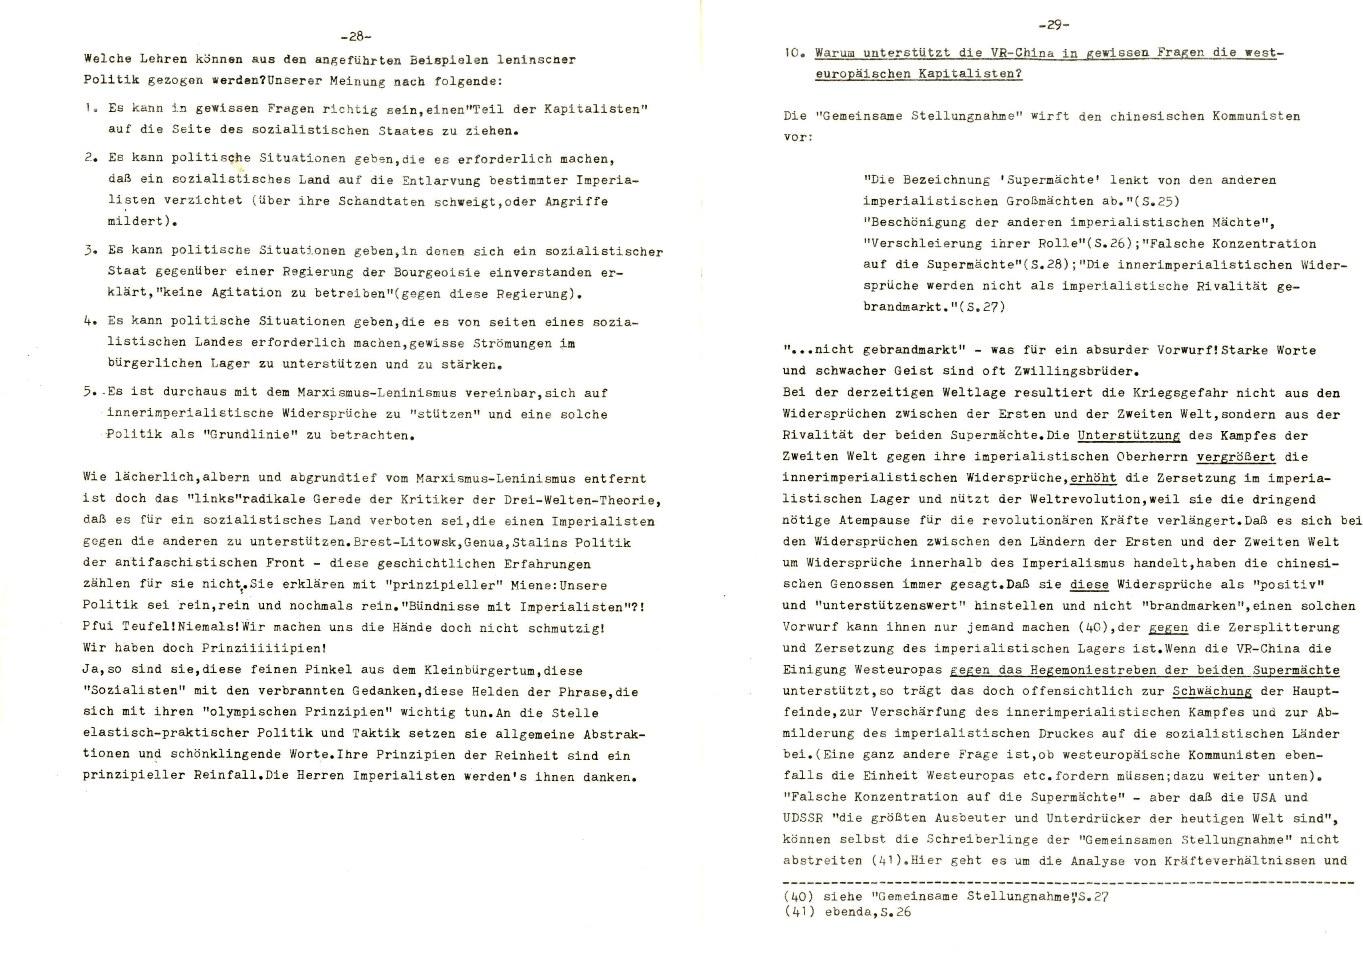 Muenchen_Kampf_dem_Revisionismus_1978_04_05_16